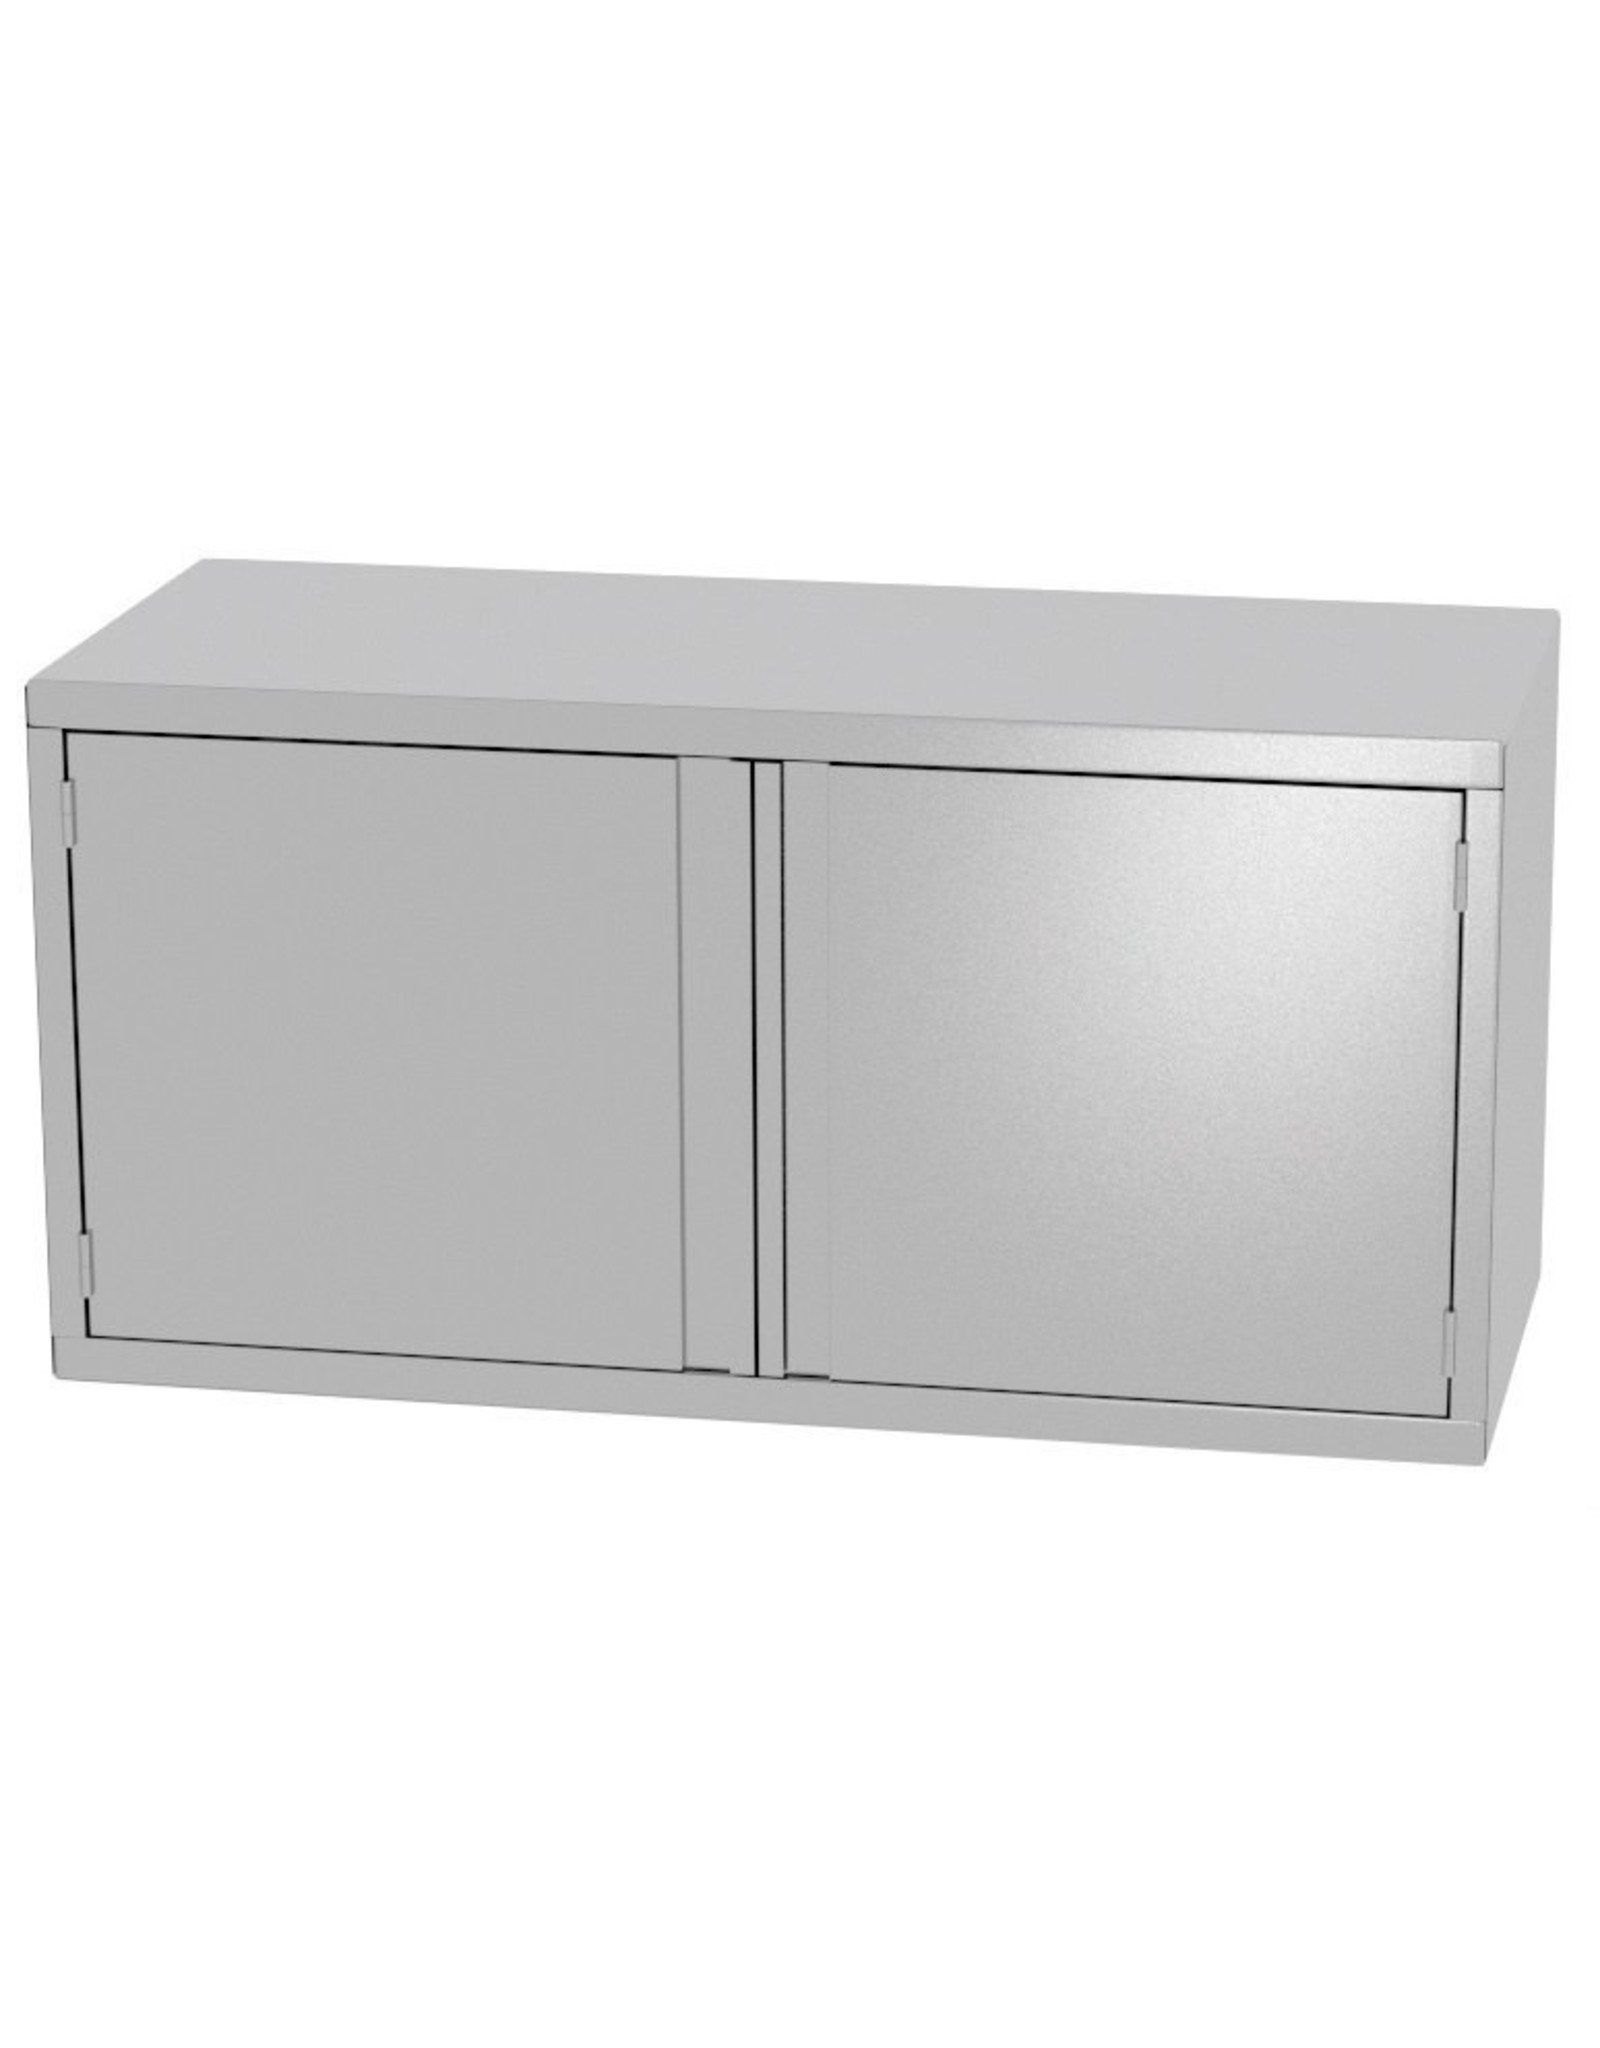 Wandkast | met 2 klapdeuren | 700-1300mm breed | 300 of 400mm diep | 600mm hoog